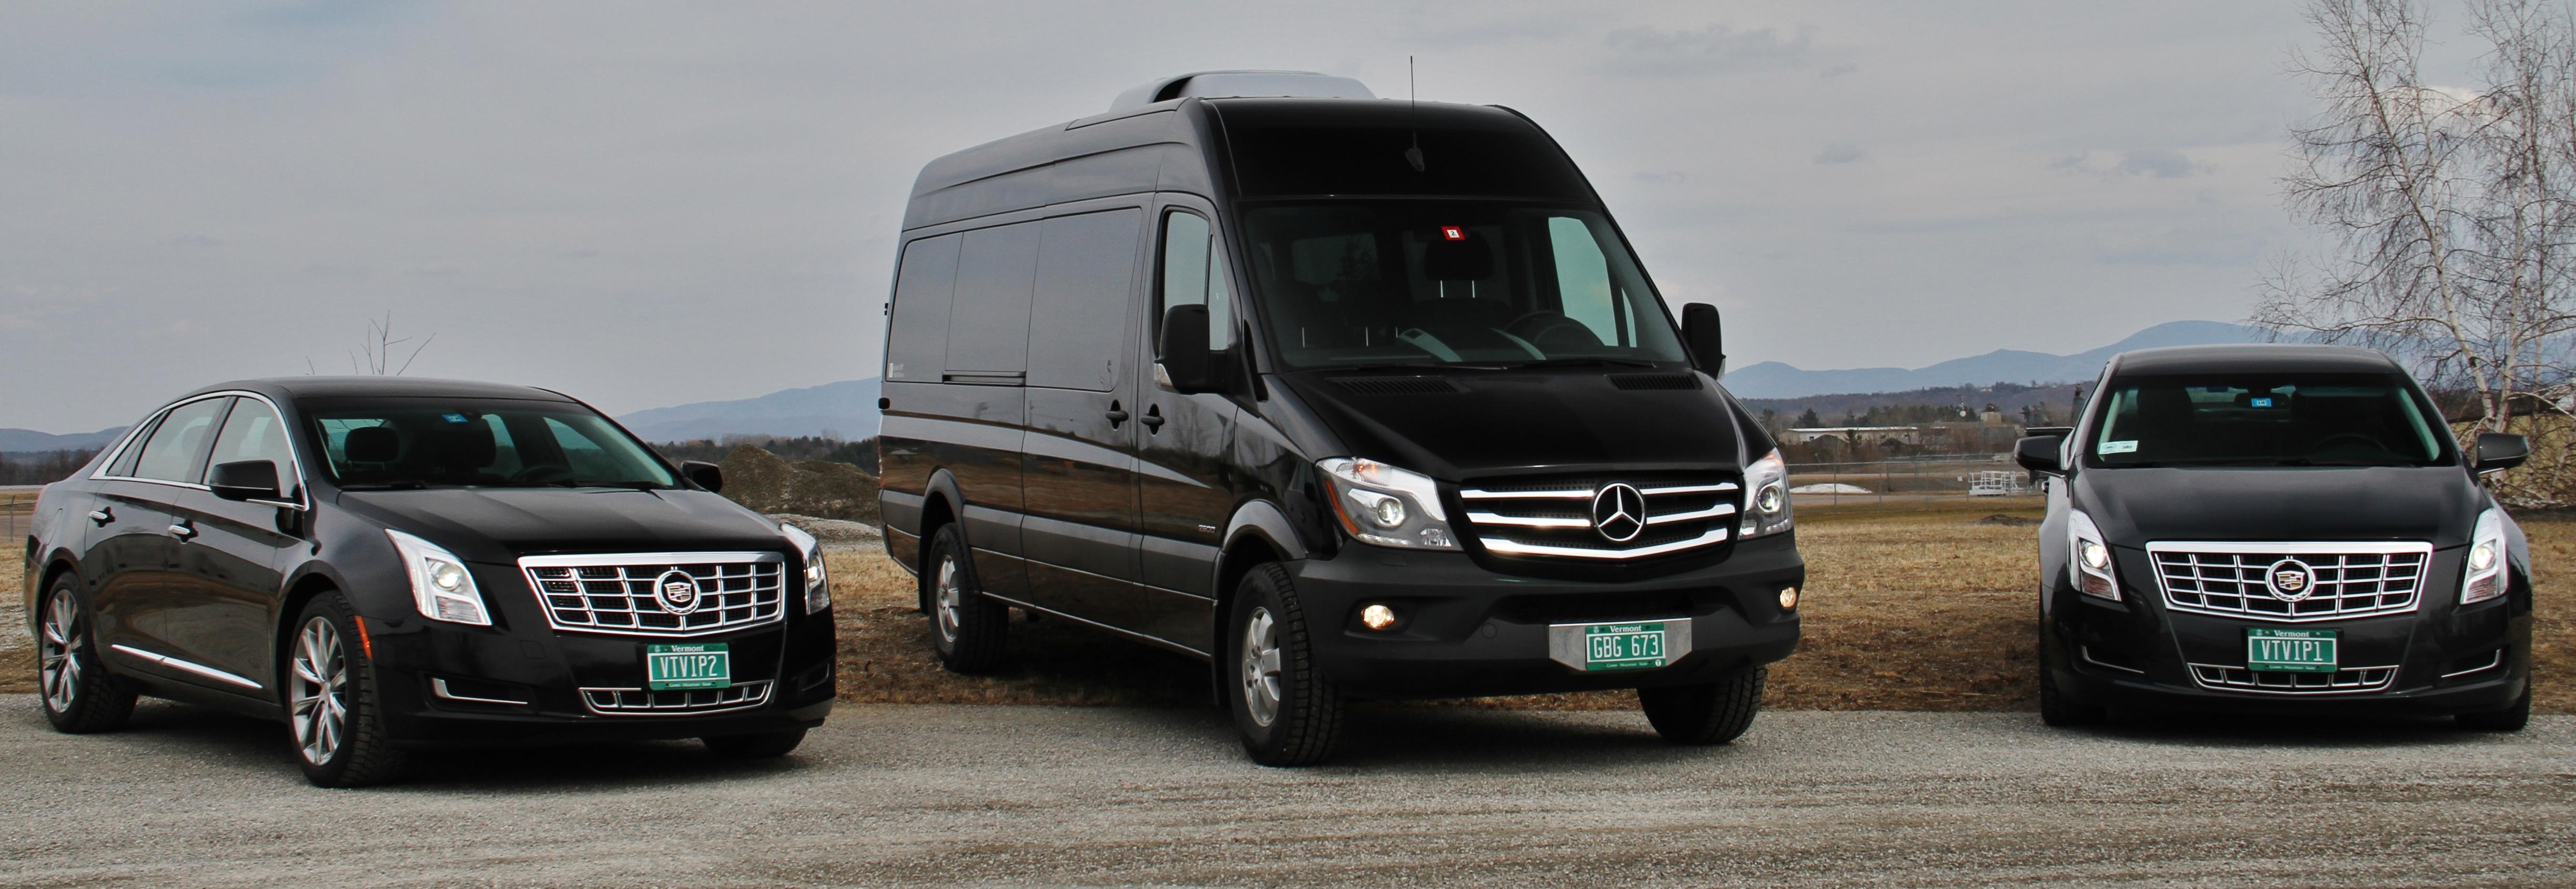 Vermont Wedding Limousine Service